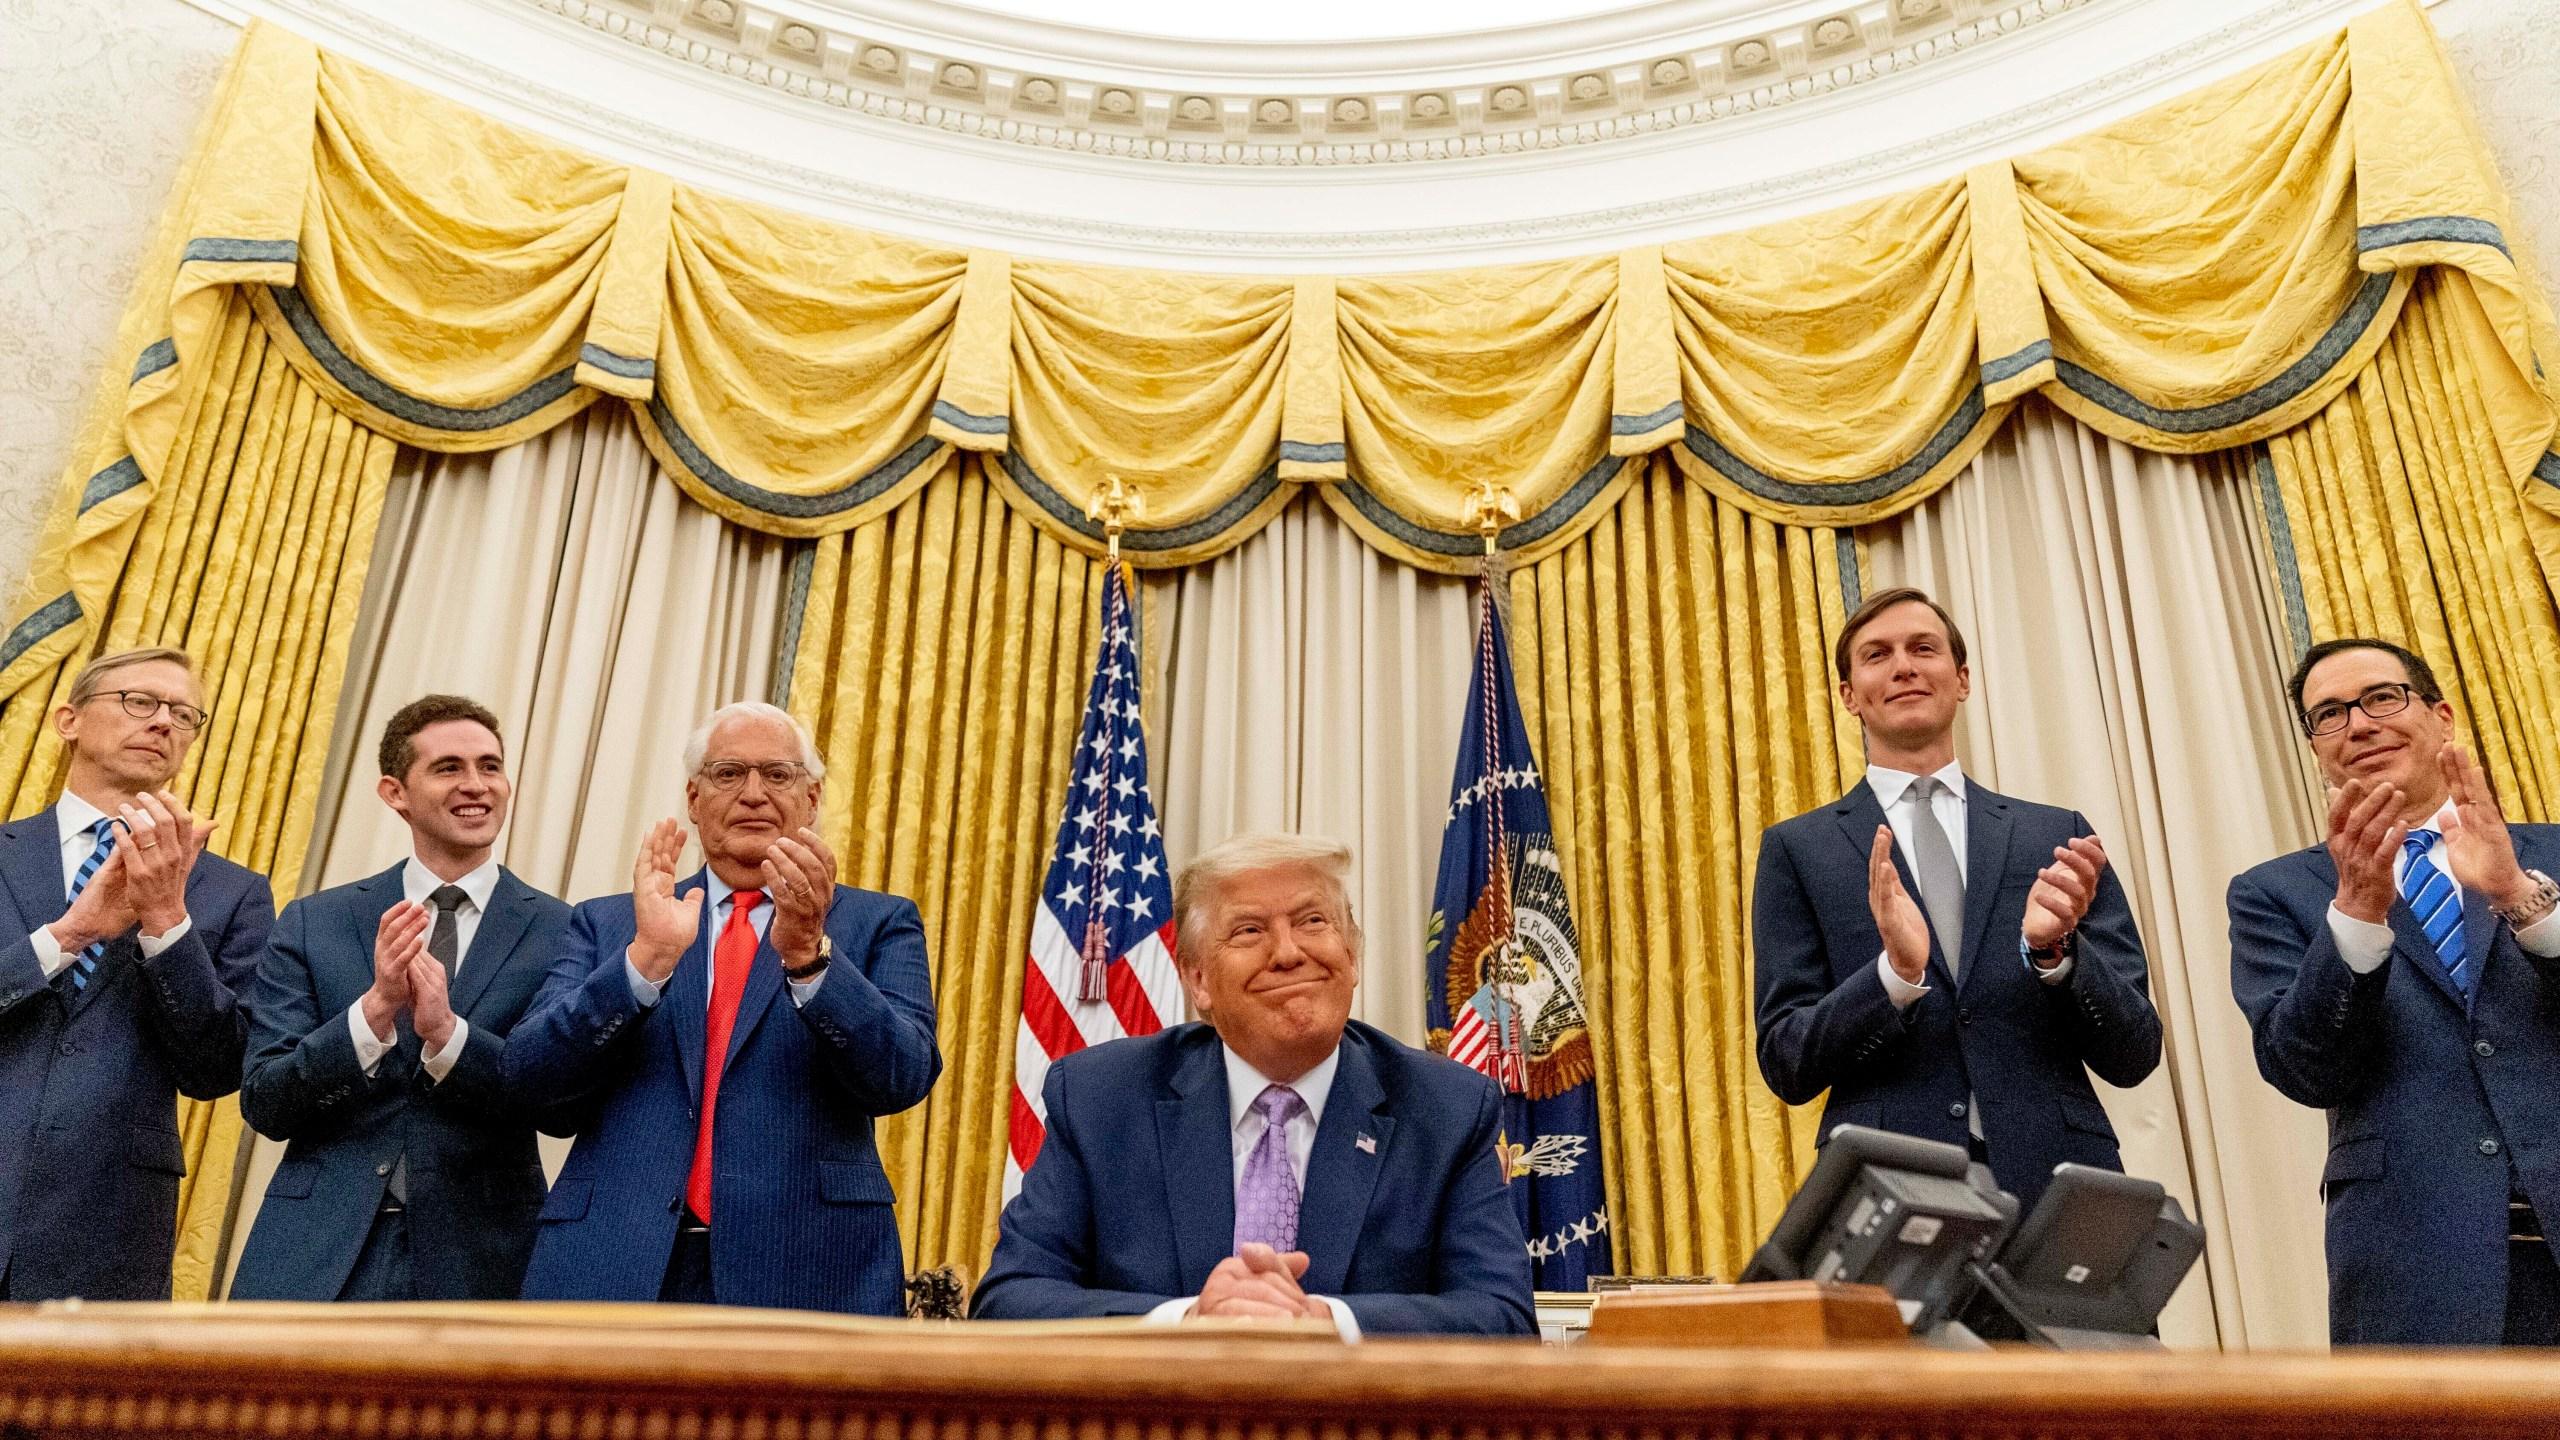 Donald Trump, David Friedman, Avraham Berkowitz, Brian Hook, Jared Kushner, Steven Mnuchin